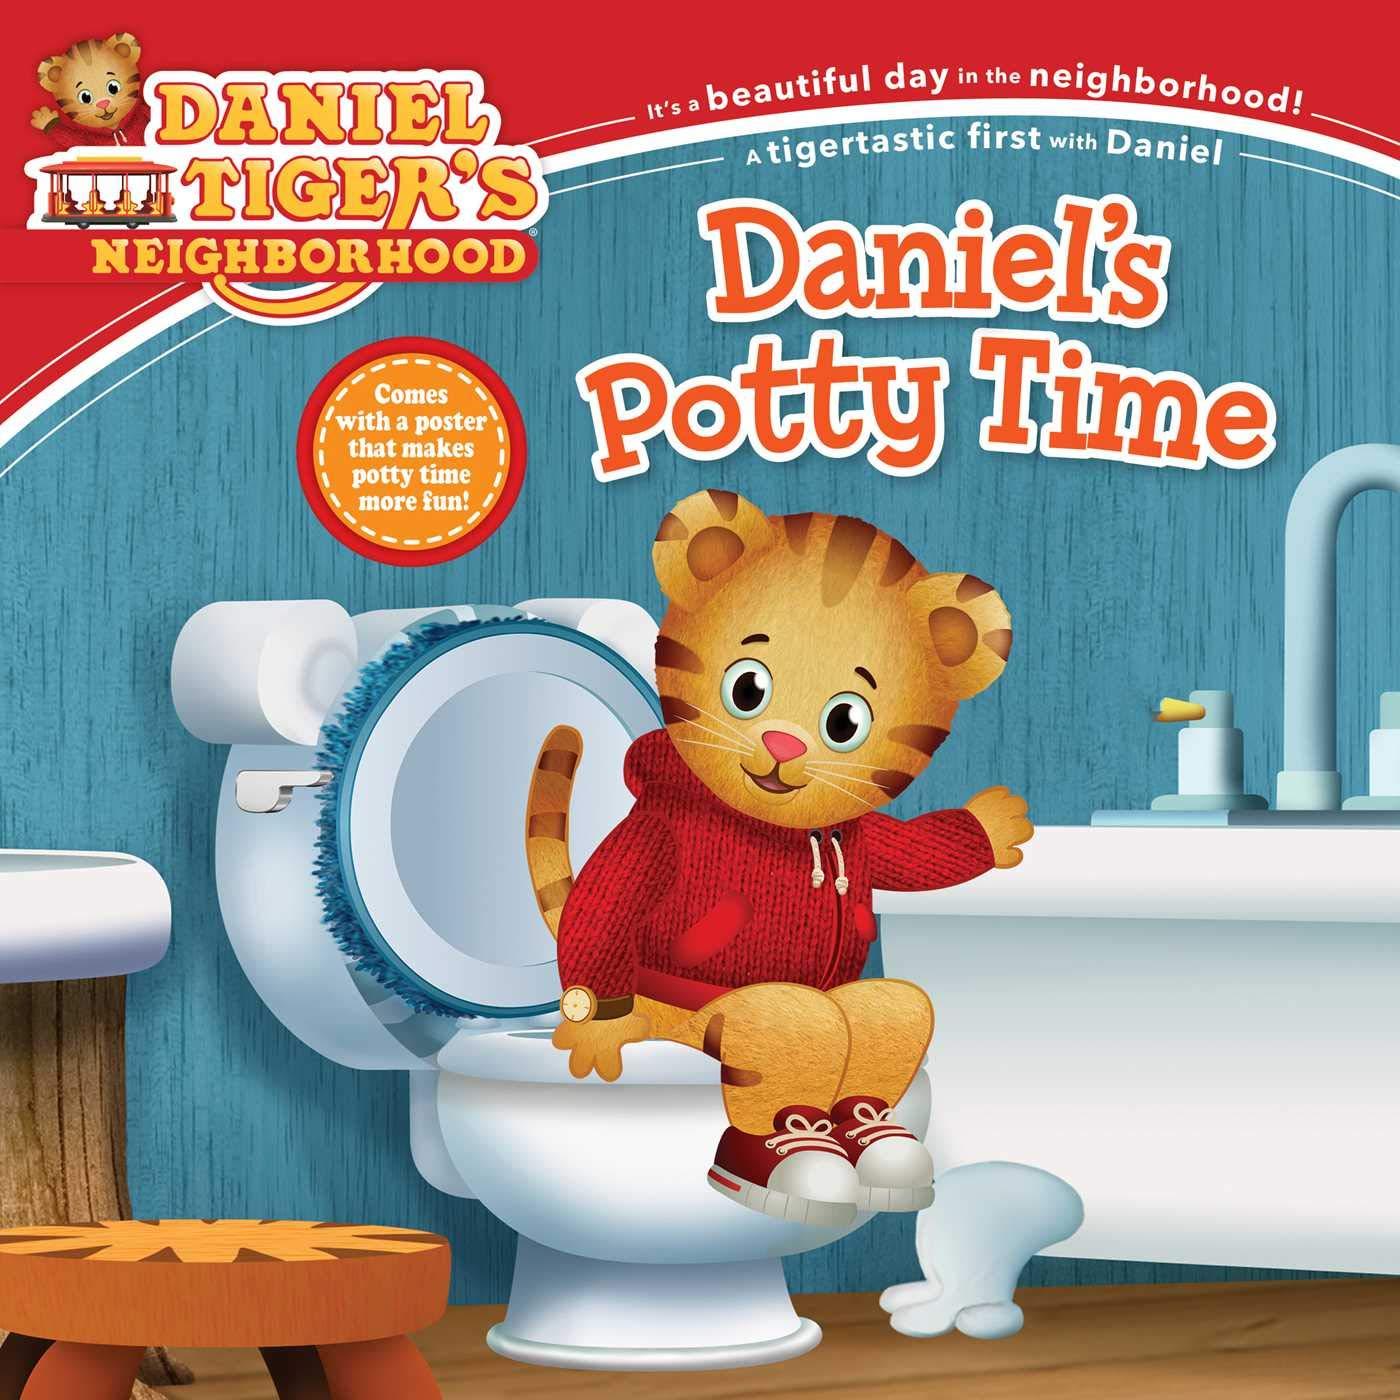 Daniel's Potty Time: Cassel Schwartz, Alexandra, Fruchter, Jason:  9781534451759: Books - Amazon.ca